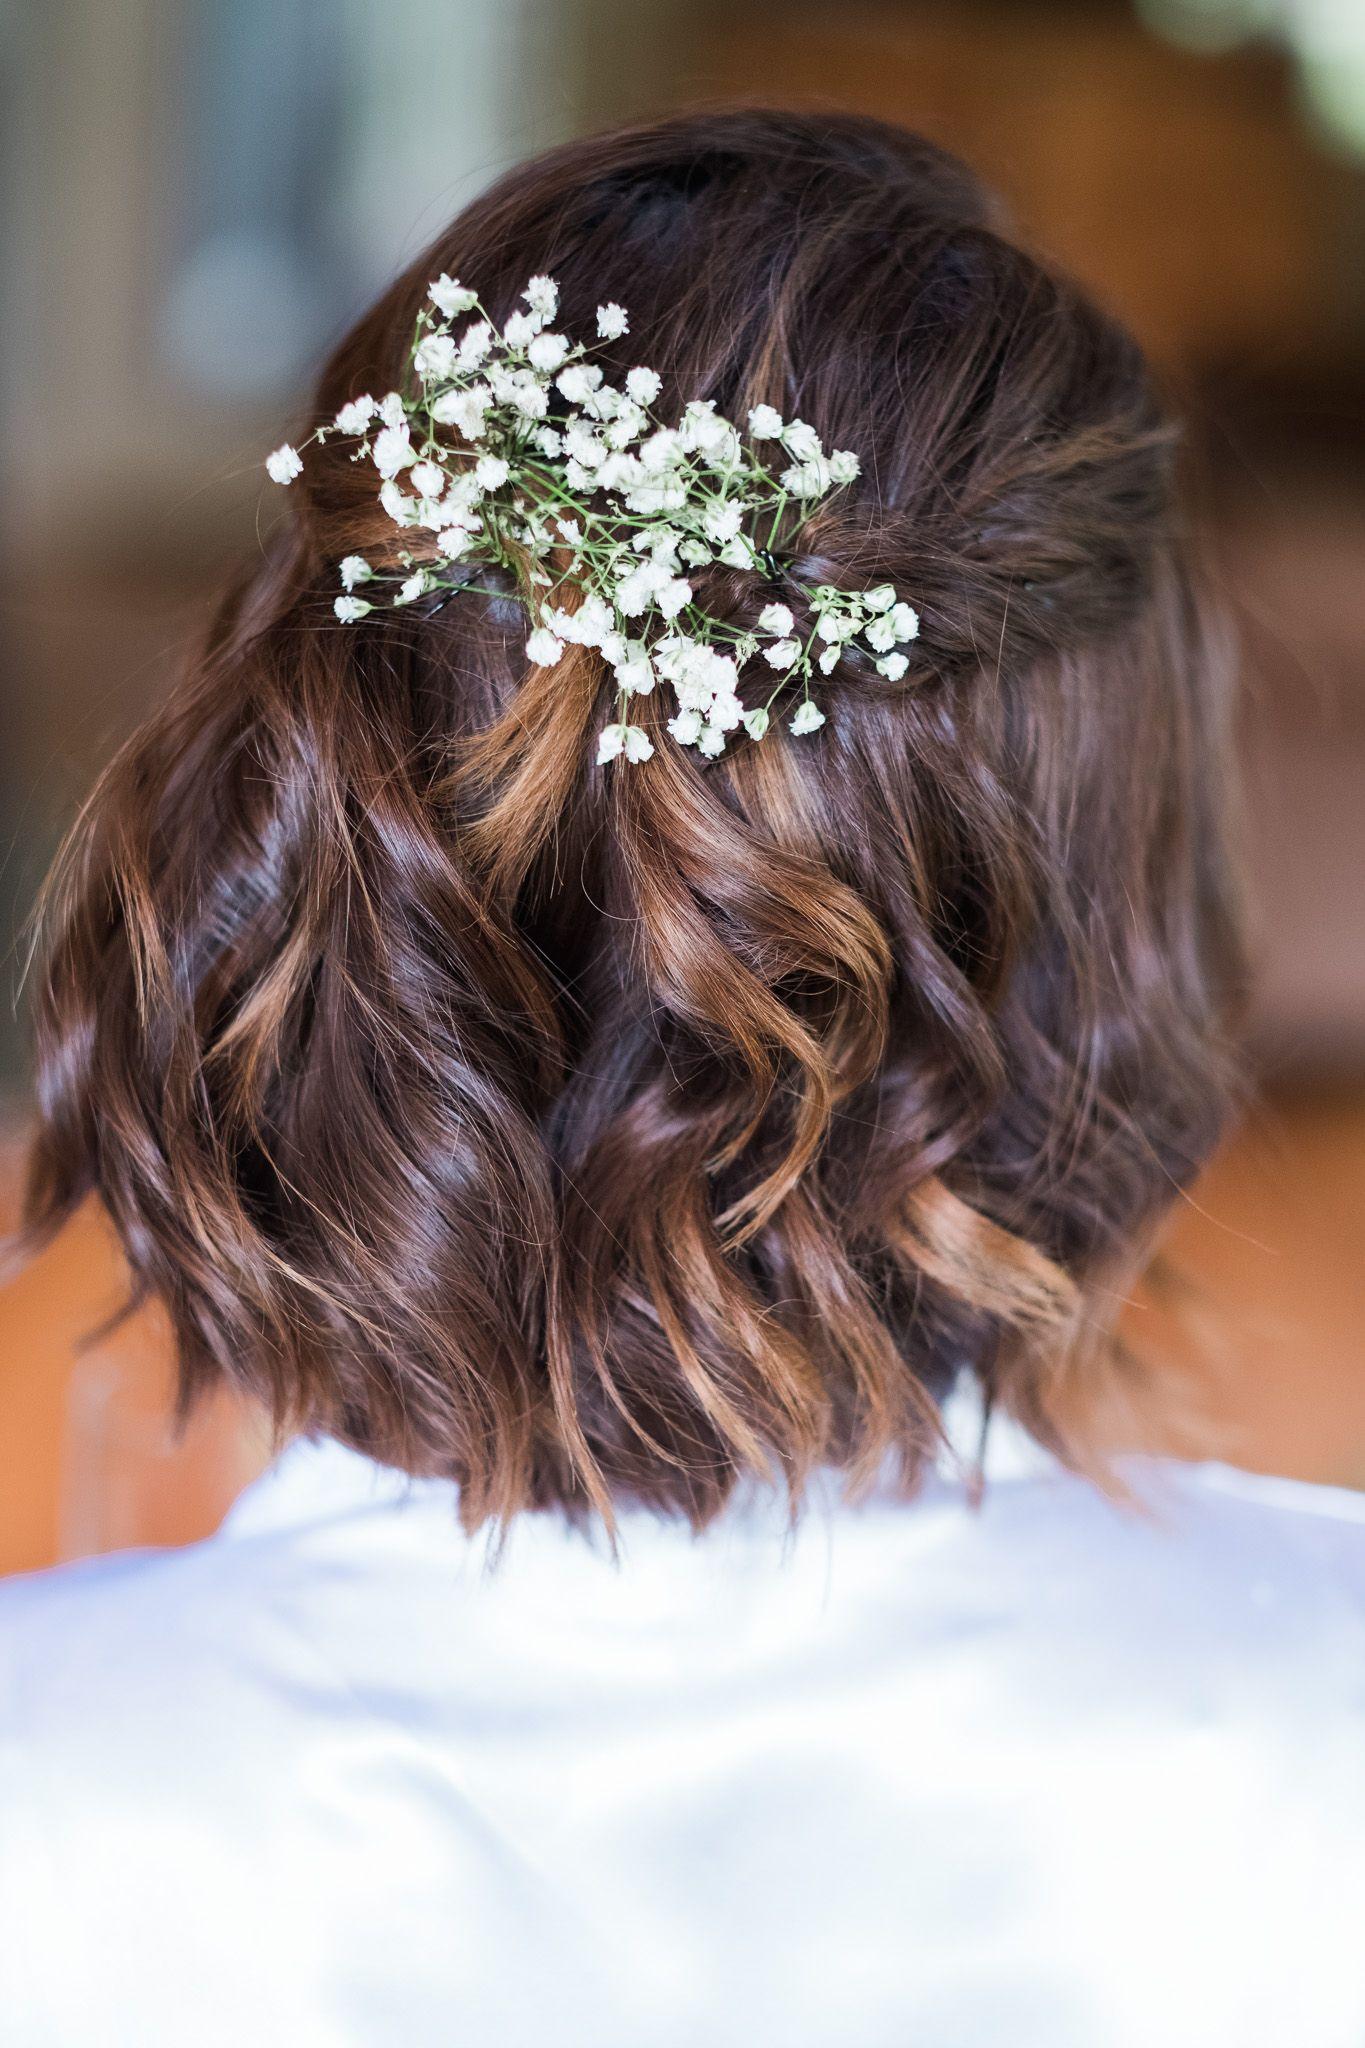 Downstyle bridal hair with babies breath Peinados Boda Pelo Corto 72769027fe8b